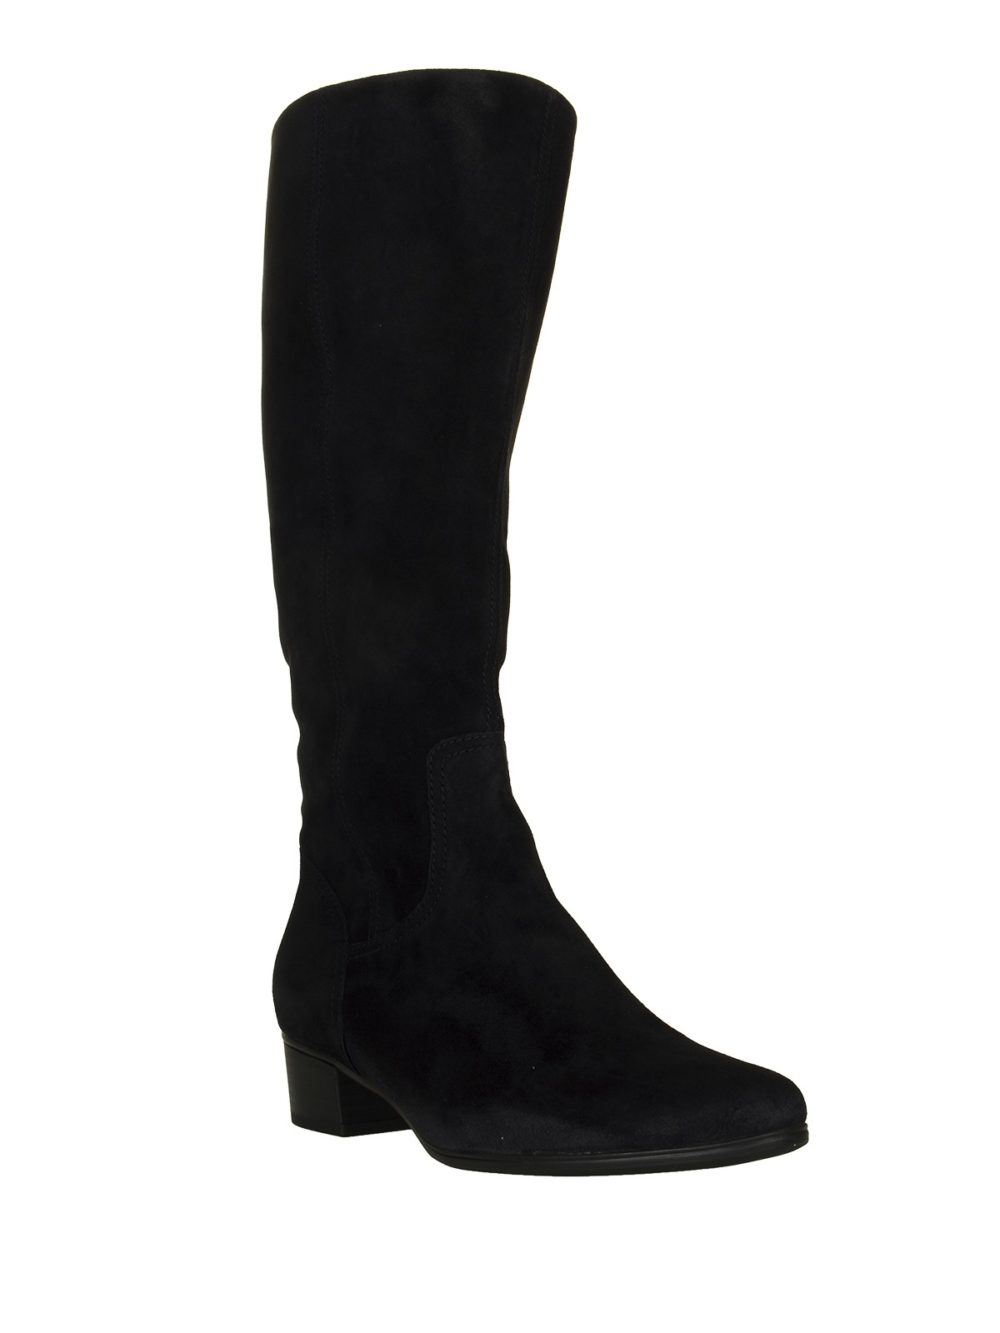 Toye Boot Gabor Katie Kerr Women's Clothing Women's Boots